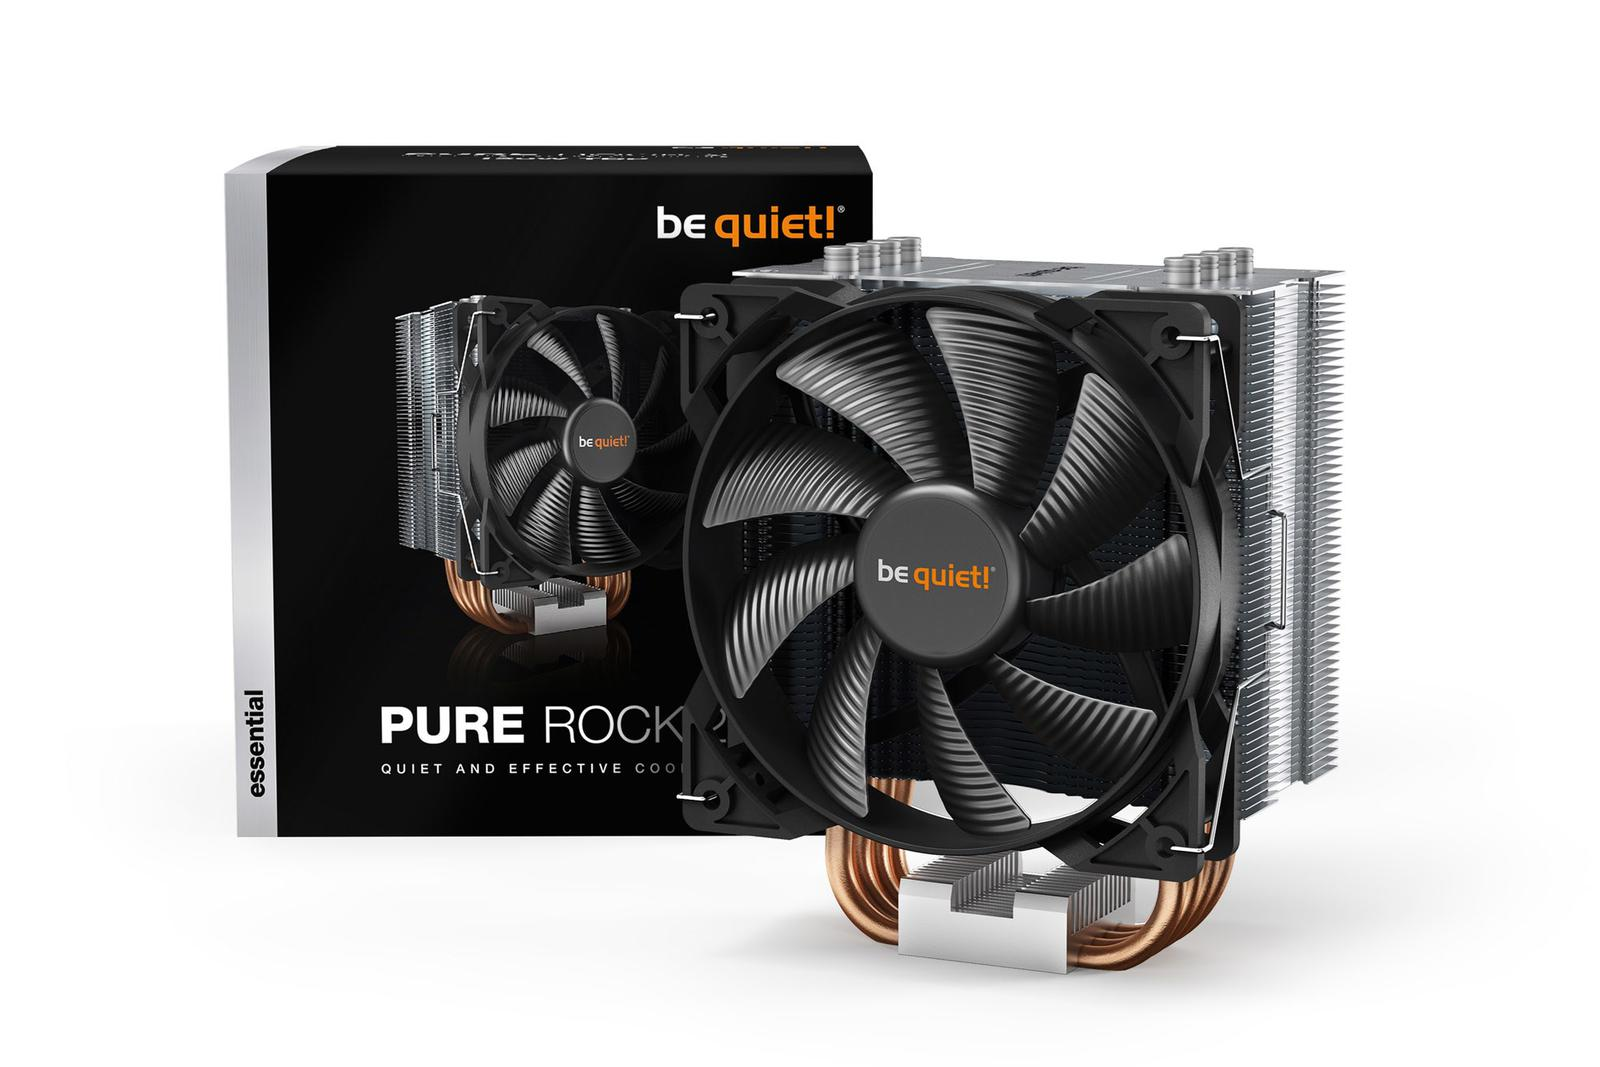 be quiet! Pure Rock 2 CPU Cooler